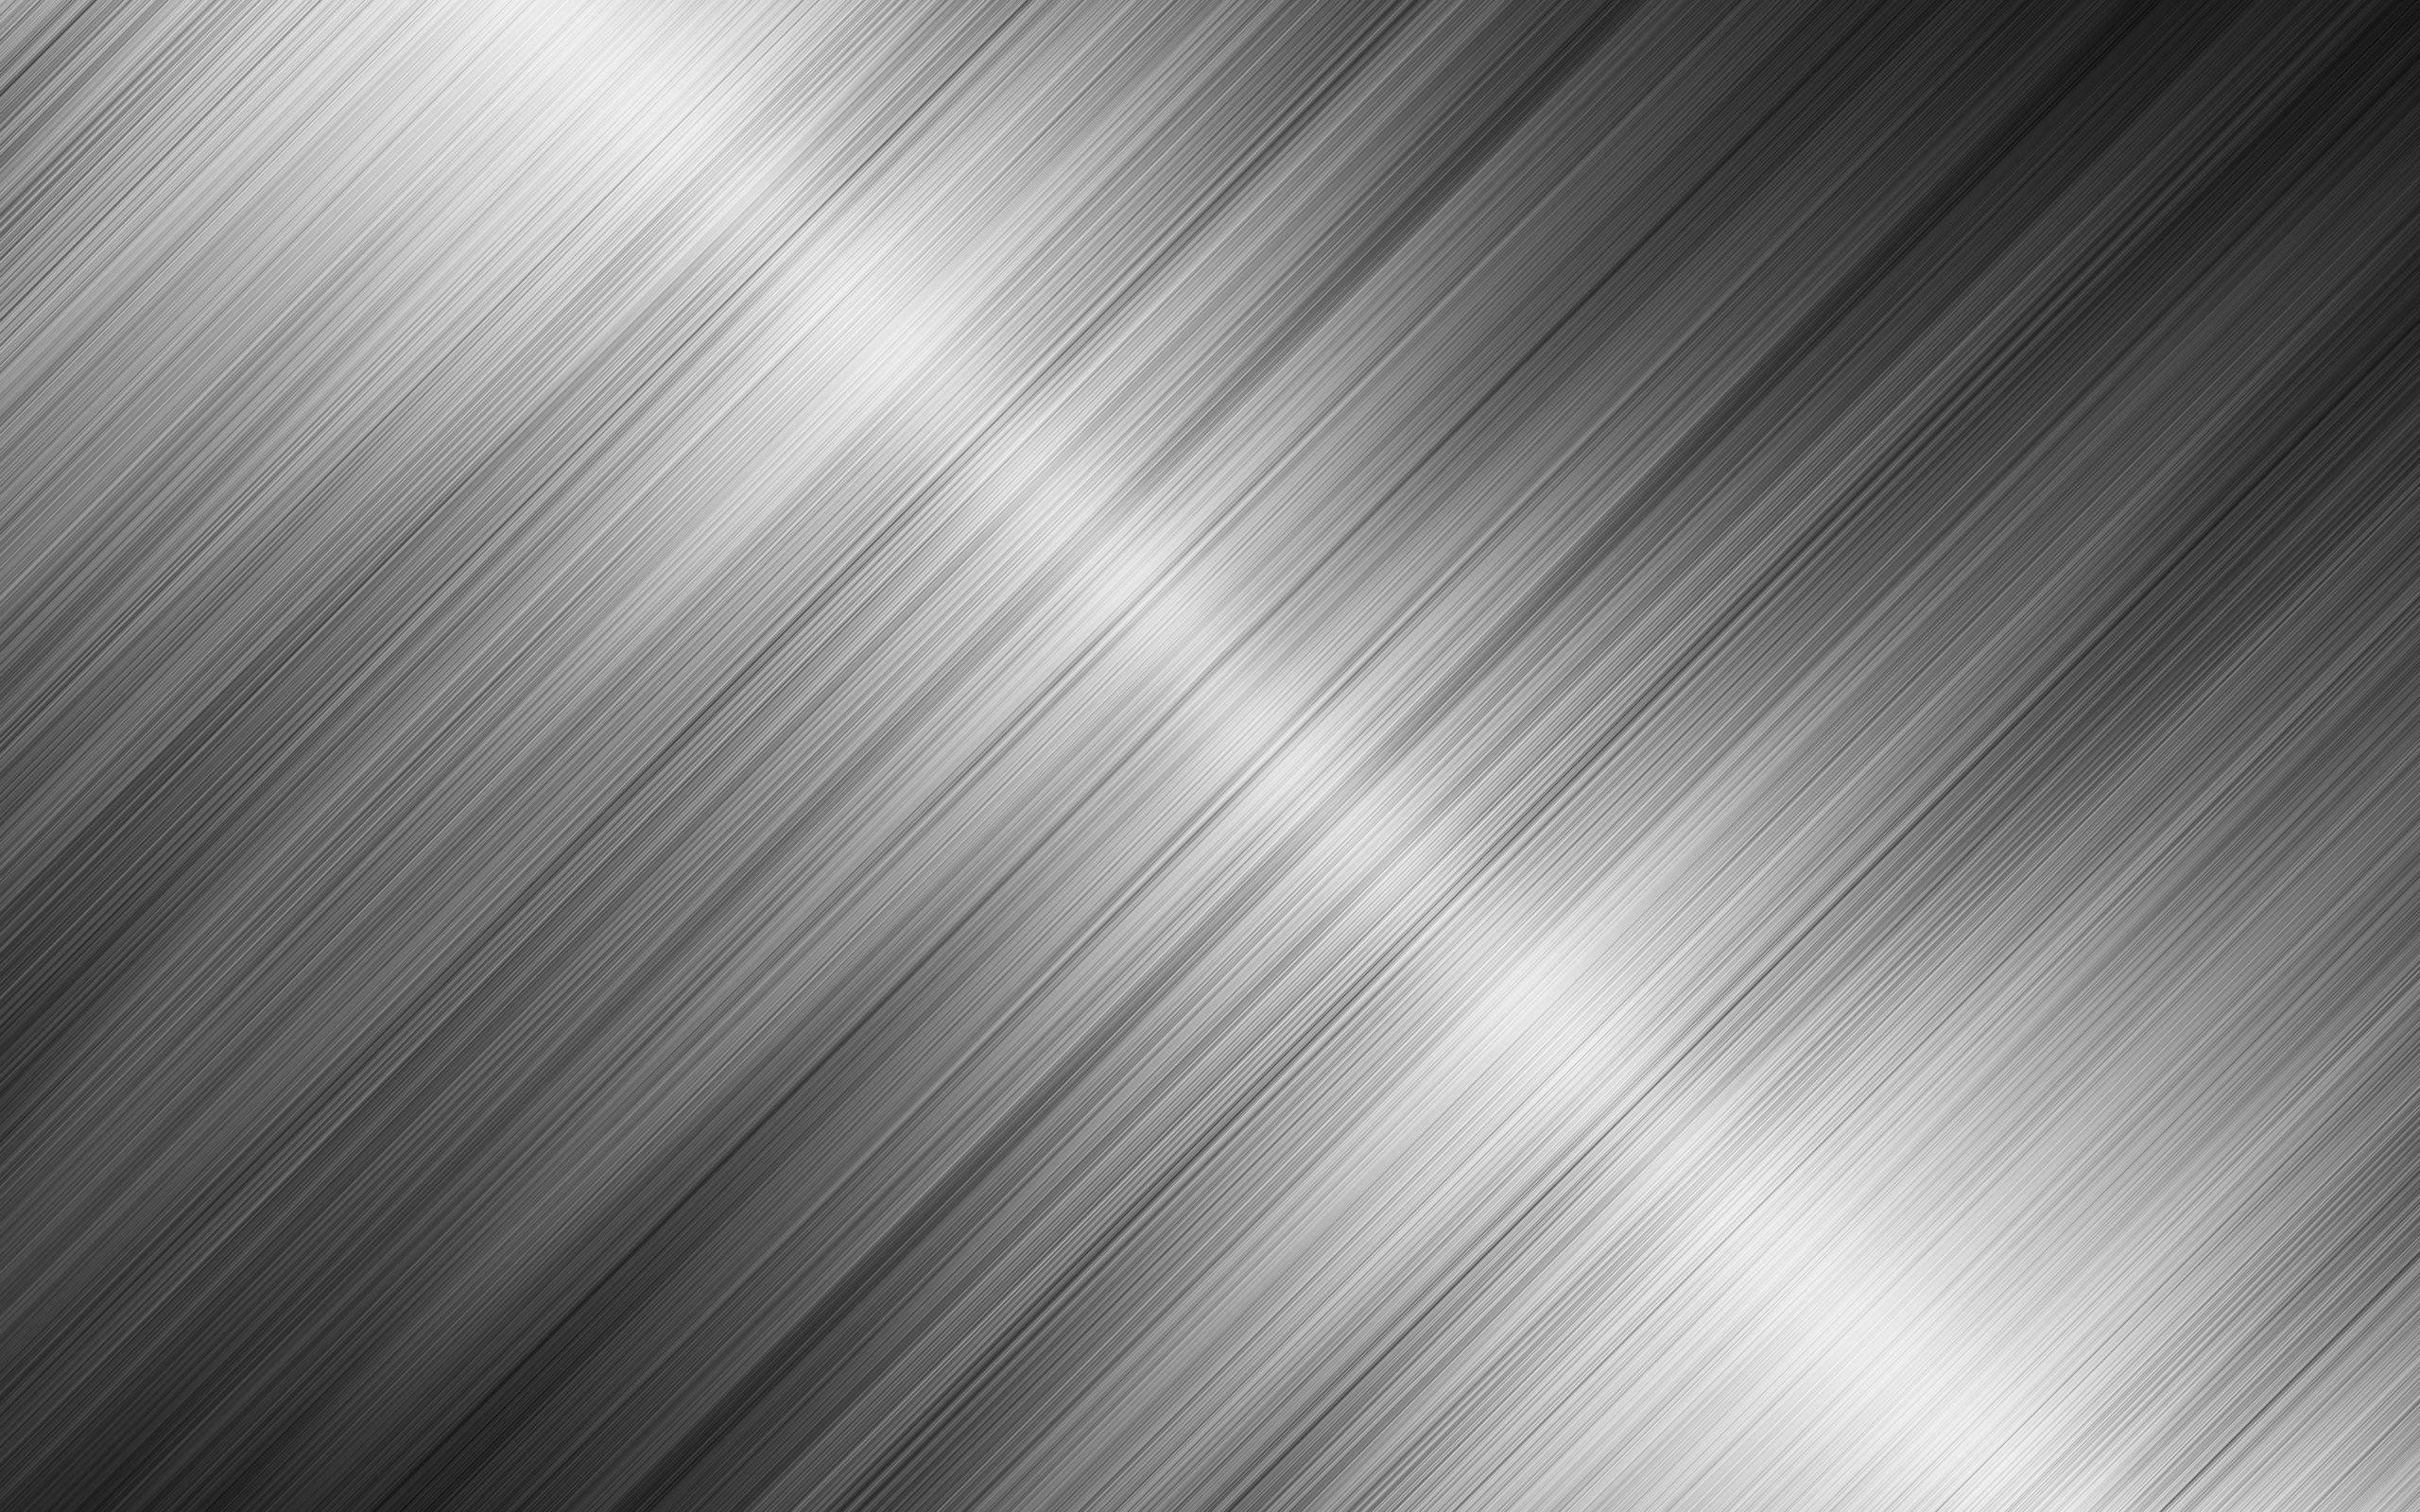 Metal 4k Wallpapers Top Free Metal 4k Backgrounds Wallpaperaccess